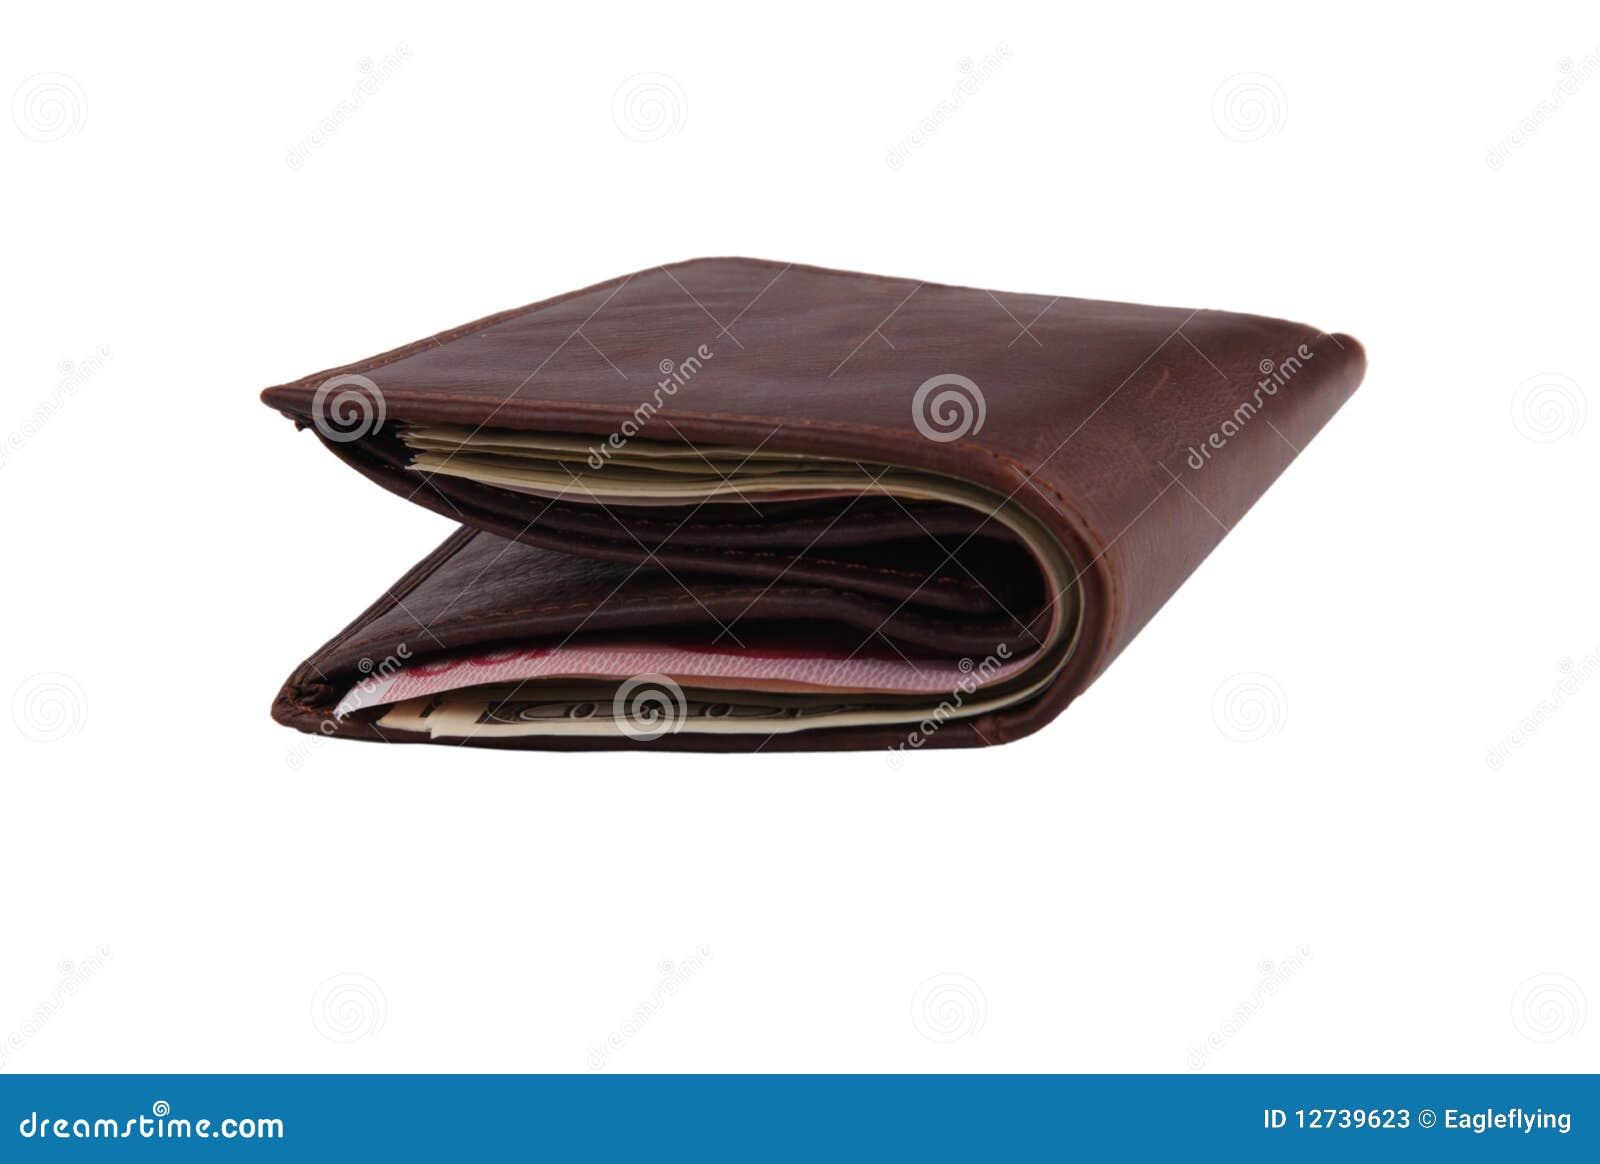 Carteira de couro de Brown enchida com as notas de banco